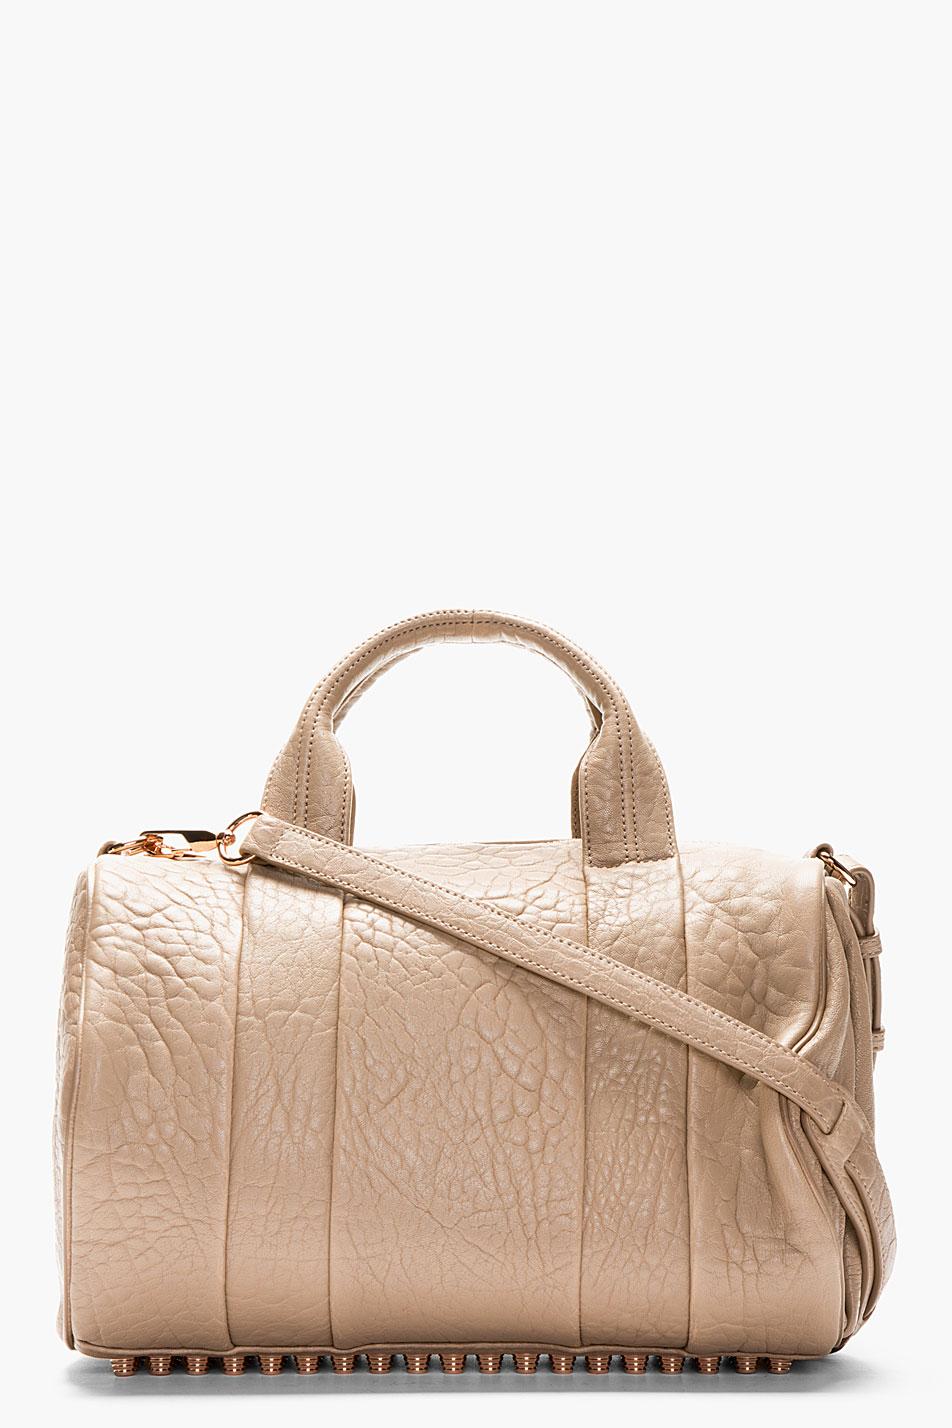 Alexander wang latte pebbled leather rocco bag